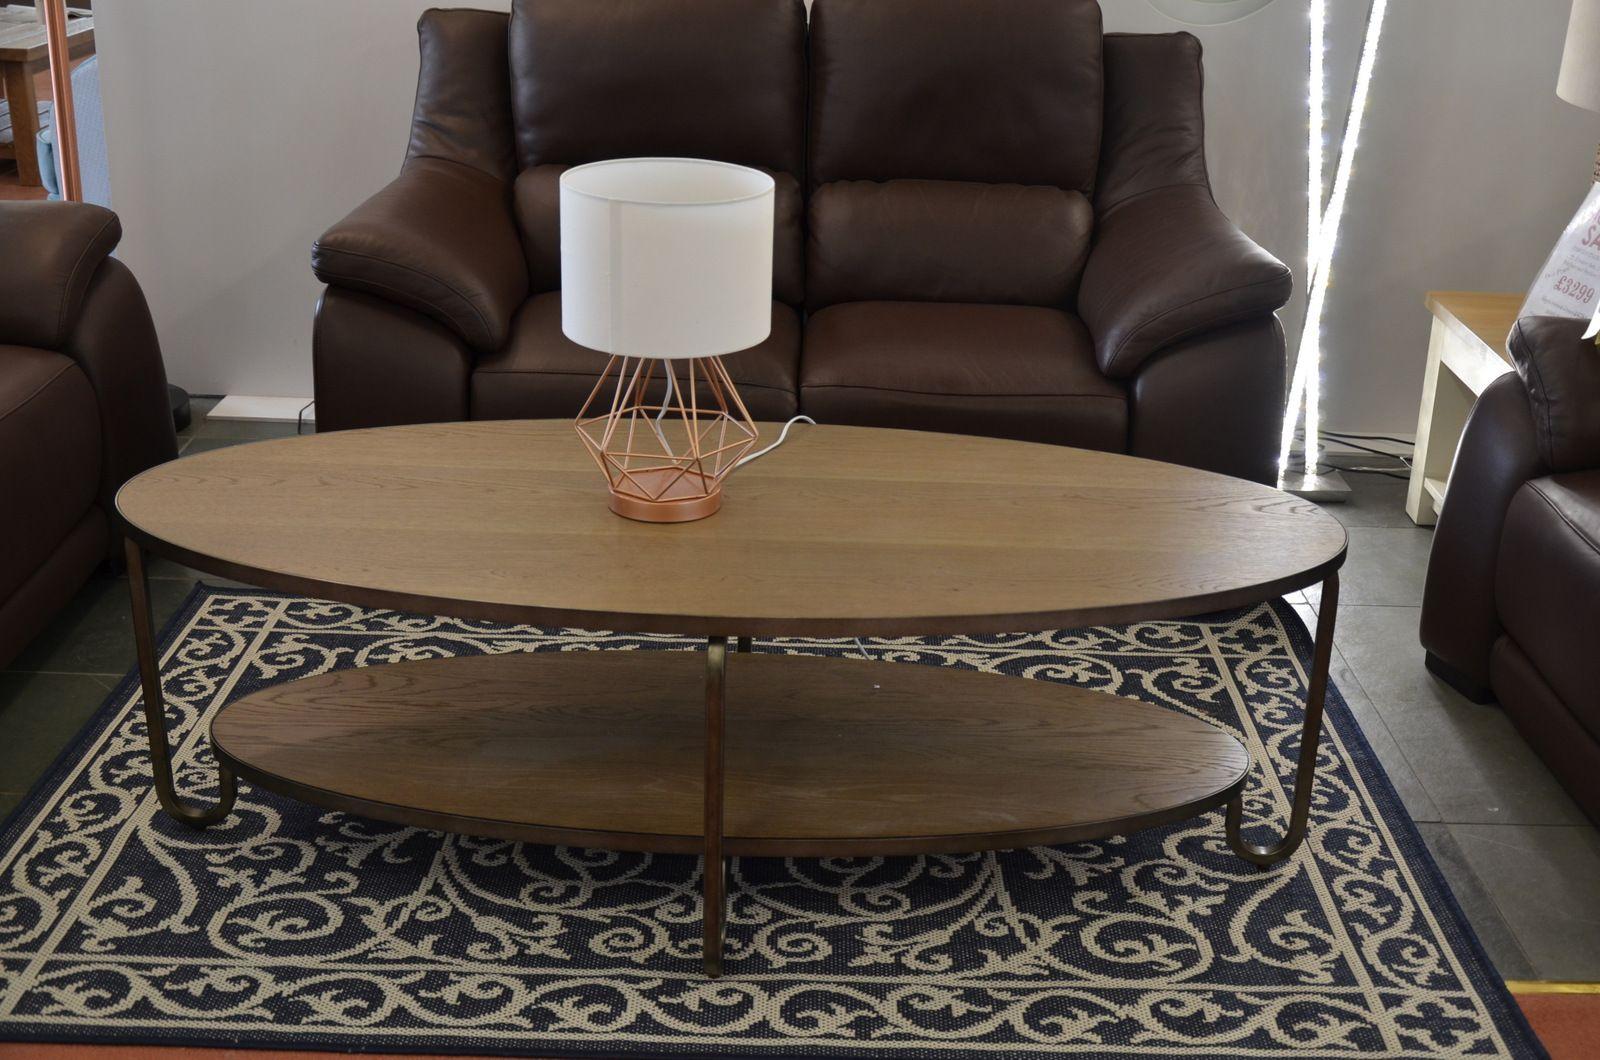 camden coffee table rustic oak metal industrial chic